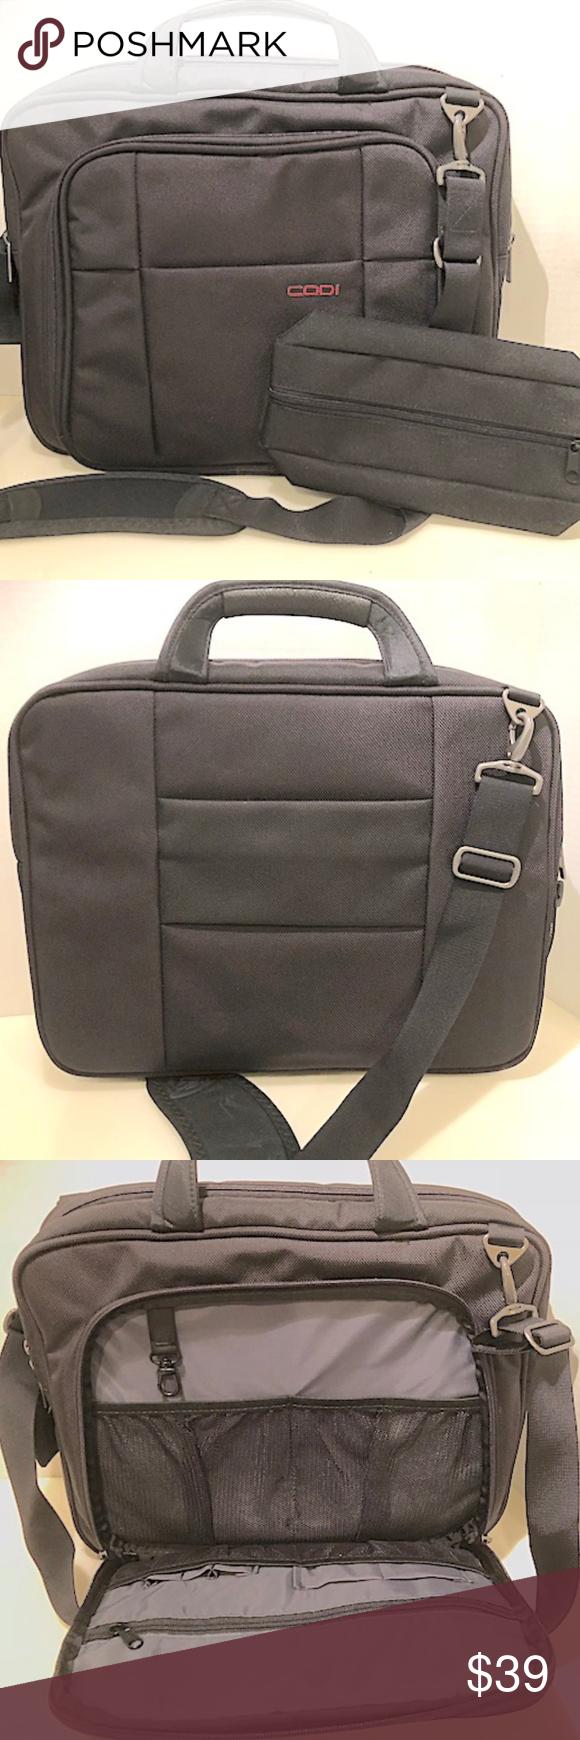 New Codi Heavy Duty Black Laptop Bag. New without tags Codi